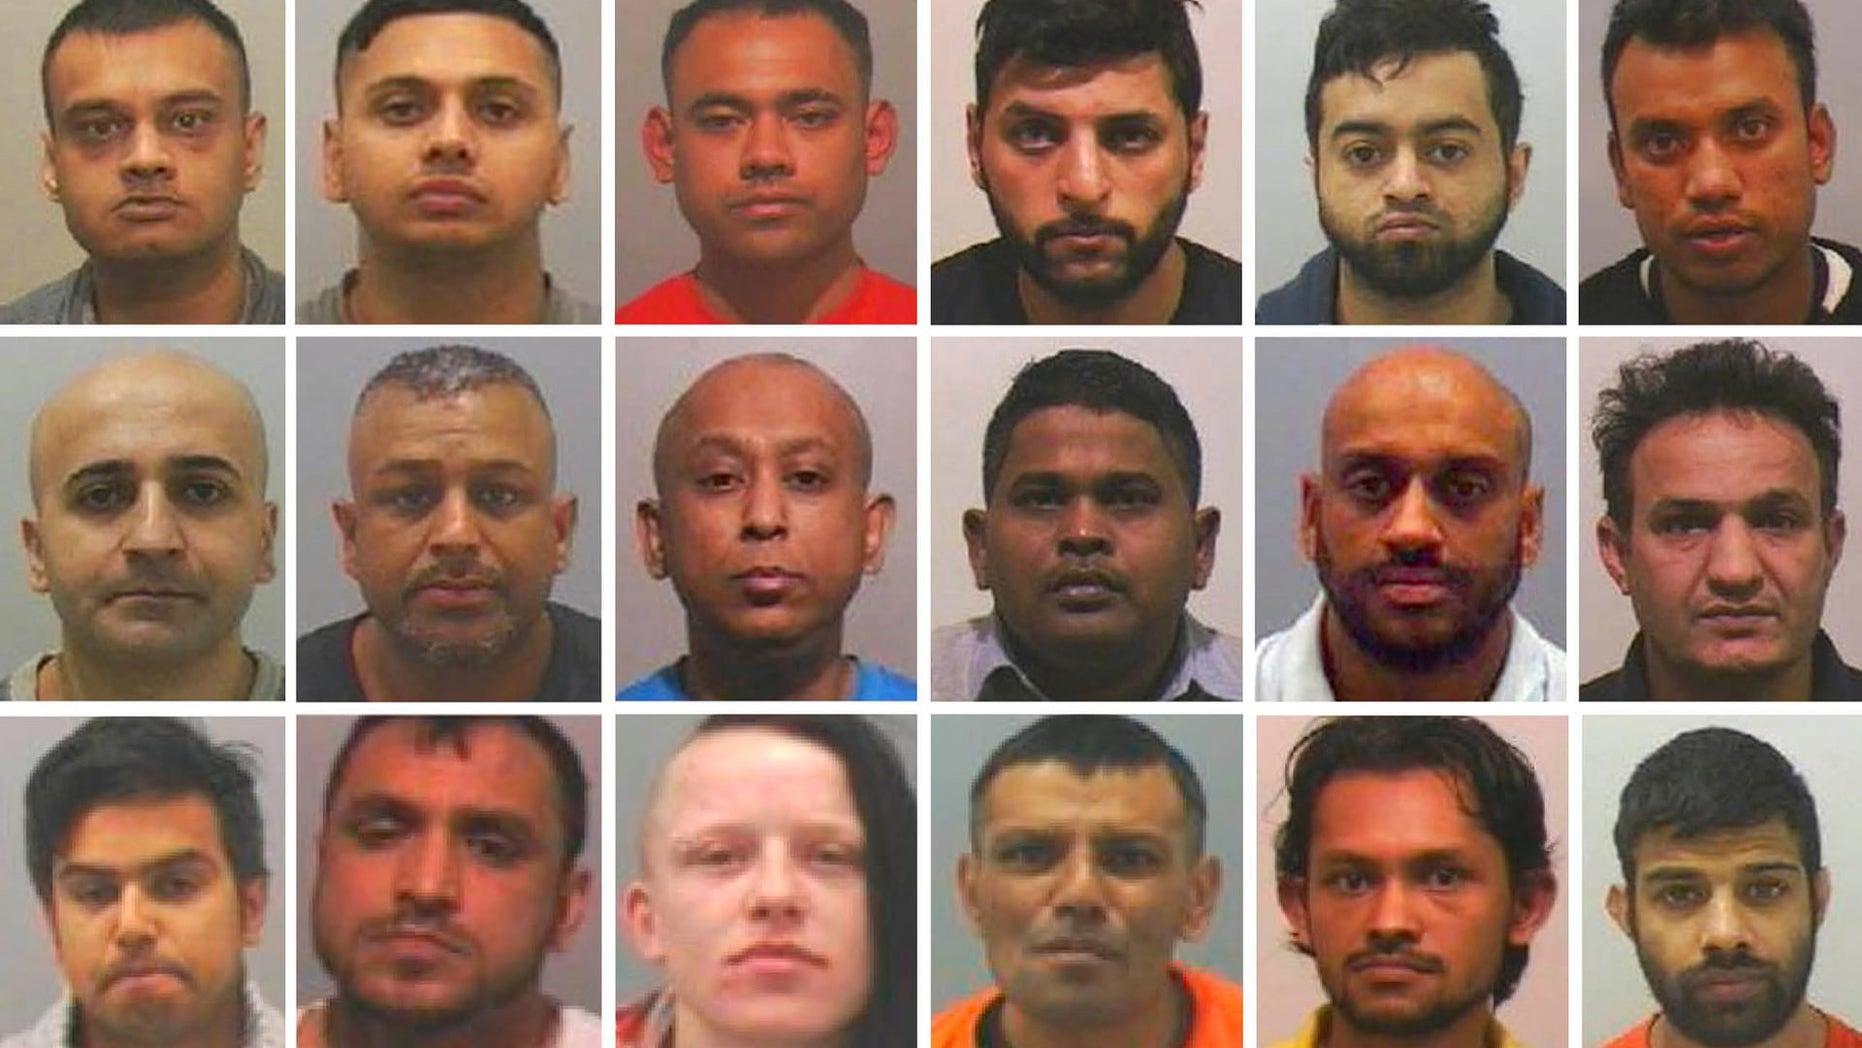 First row: Nashir Uddin, Taherul Alam, Mohammed Hassan Ali, Mohammed Azram, Monjur Choudhury, Saiful Islam. Second row: Abdulhamid Minoyee, Jahanger Zaman, Mohibur Rahman, Prabhat Nelli, Nadeem Aslam, Eisa Mousavi. Third row: Habibur Rahim, Badrul Hussain, Carolann Gallon, Abdul Sabe, Redwan Siddquee, Yassar Hussain were arrested in the operation.